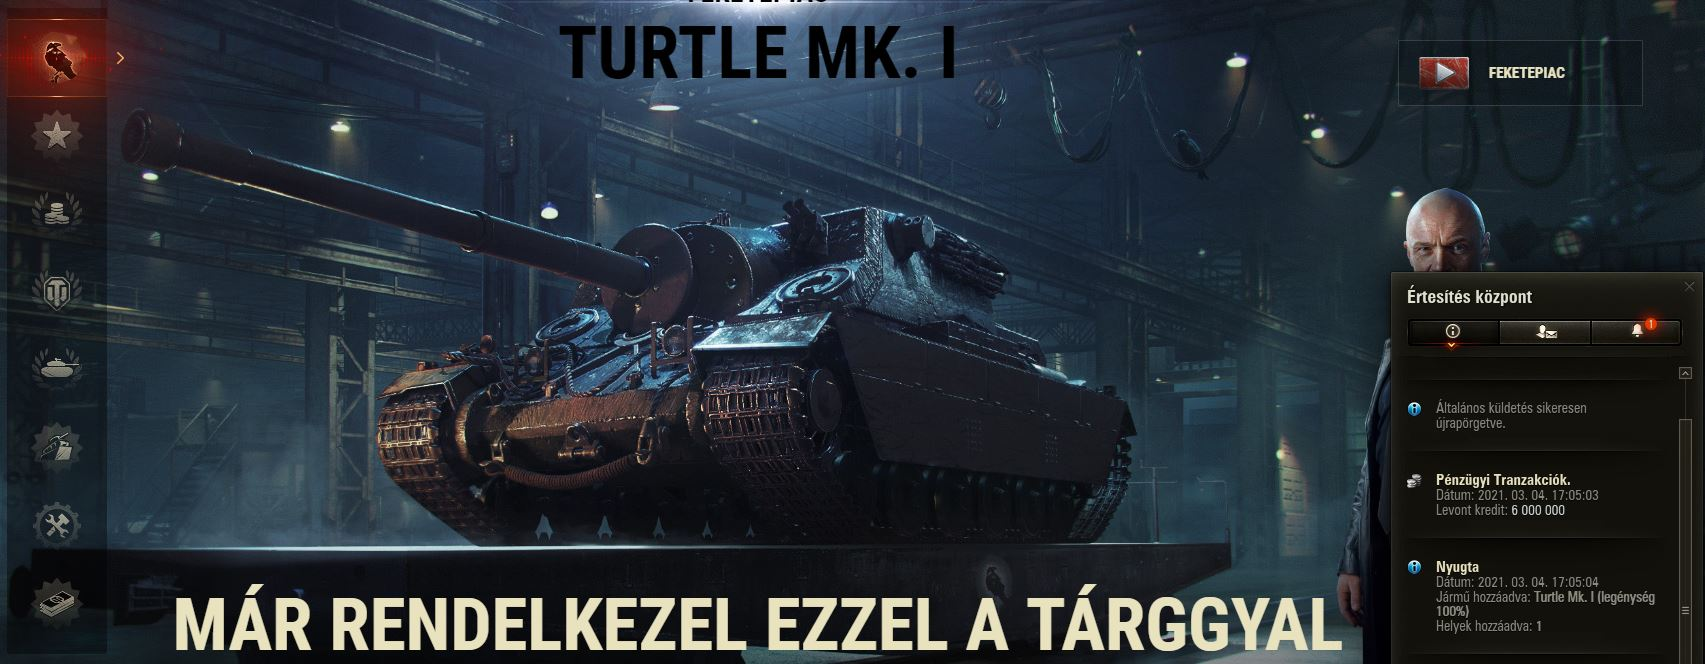 teknoc_mk1.JPG